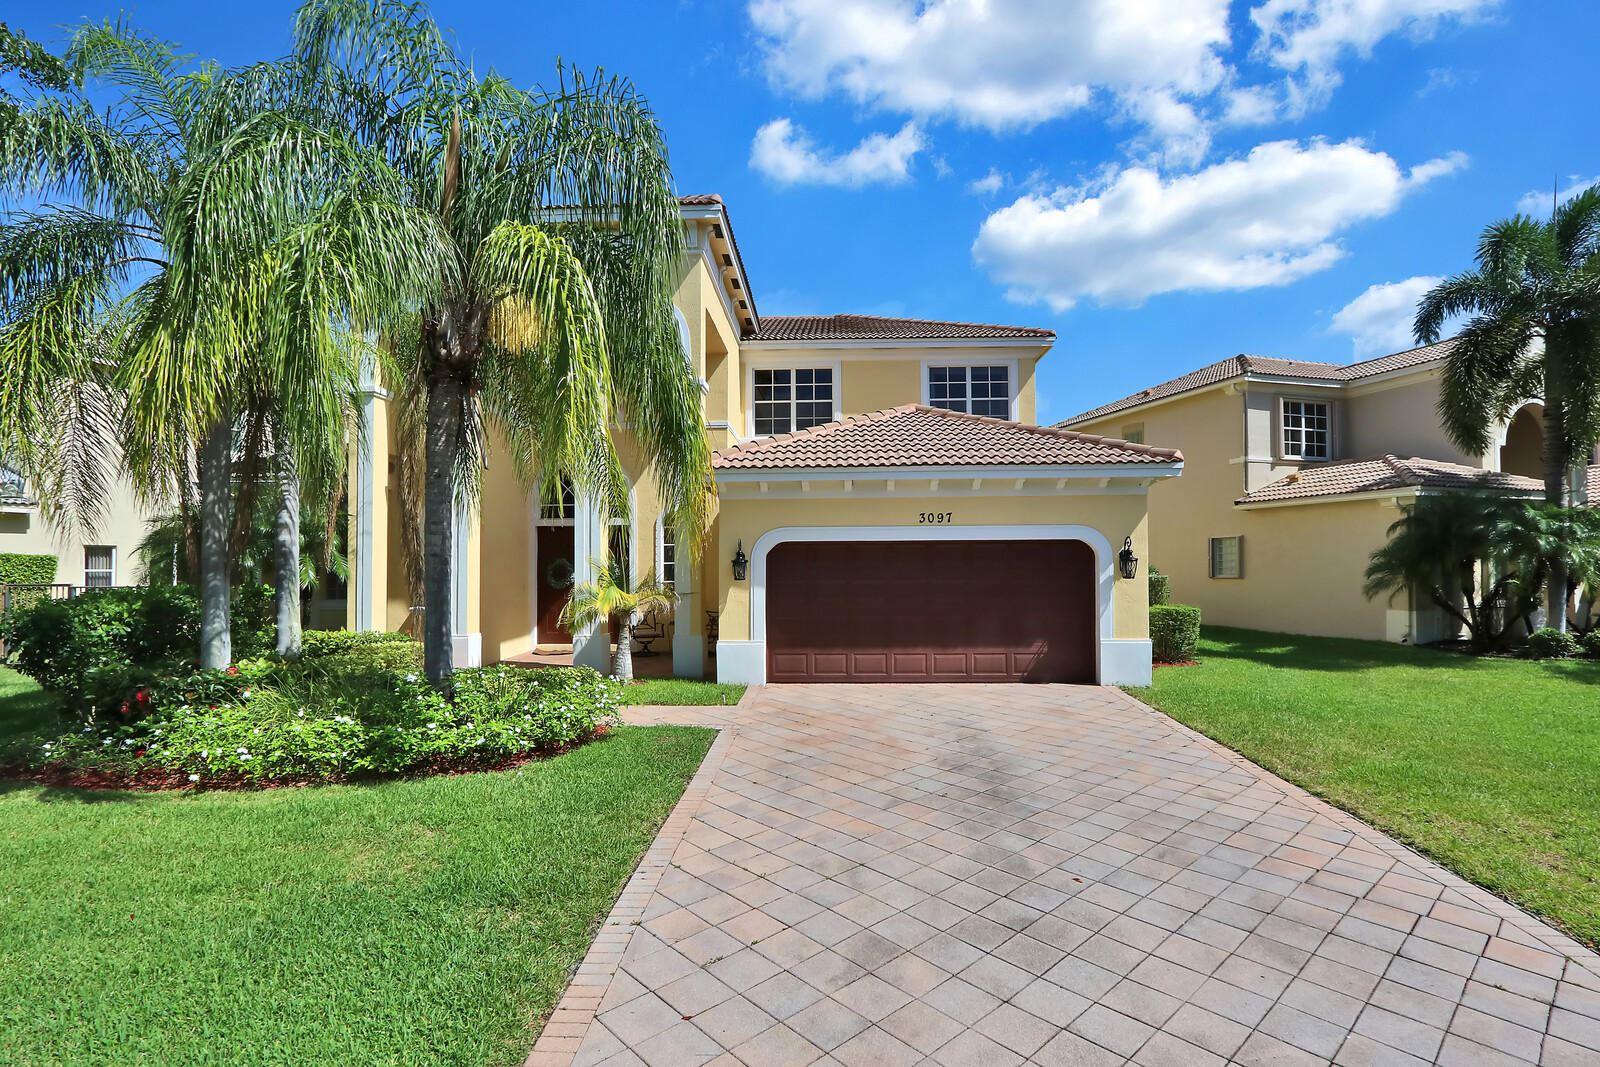 3097 Santa Margarita Road, West Palm Beach, FL 33411 - #: RX-10635718